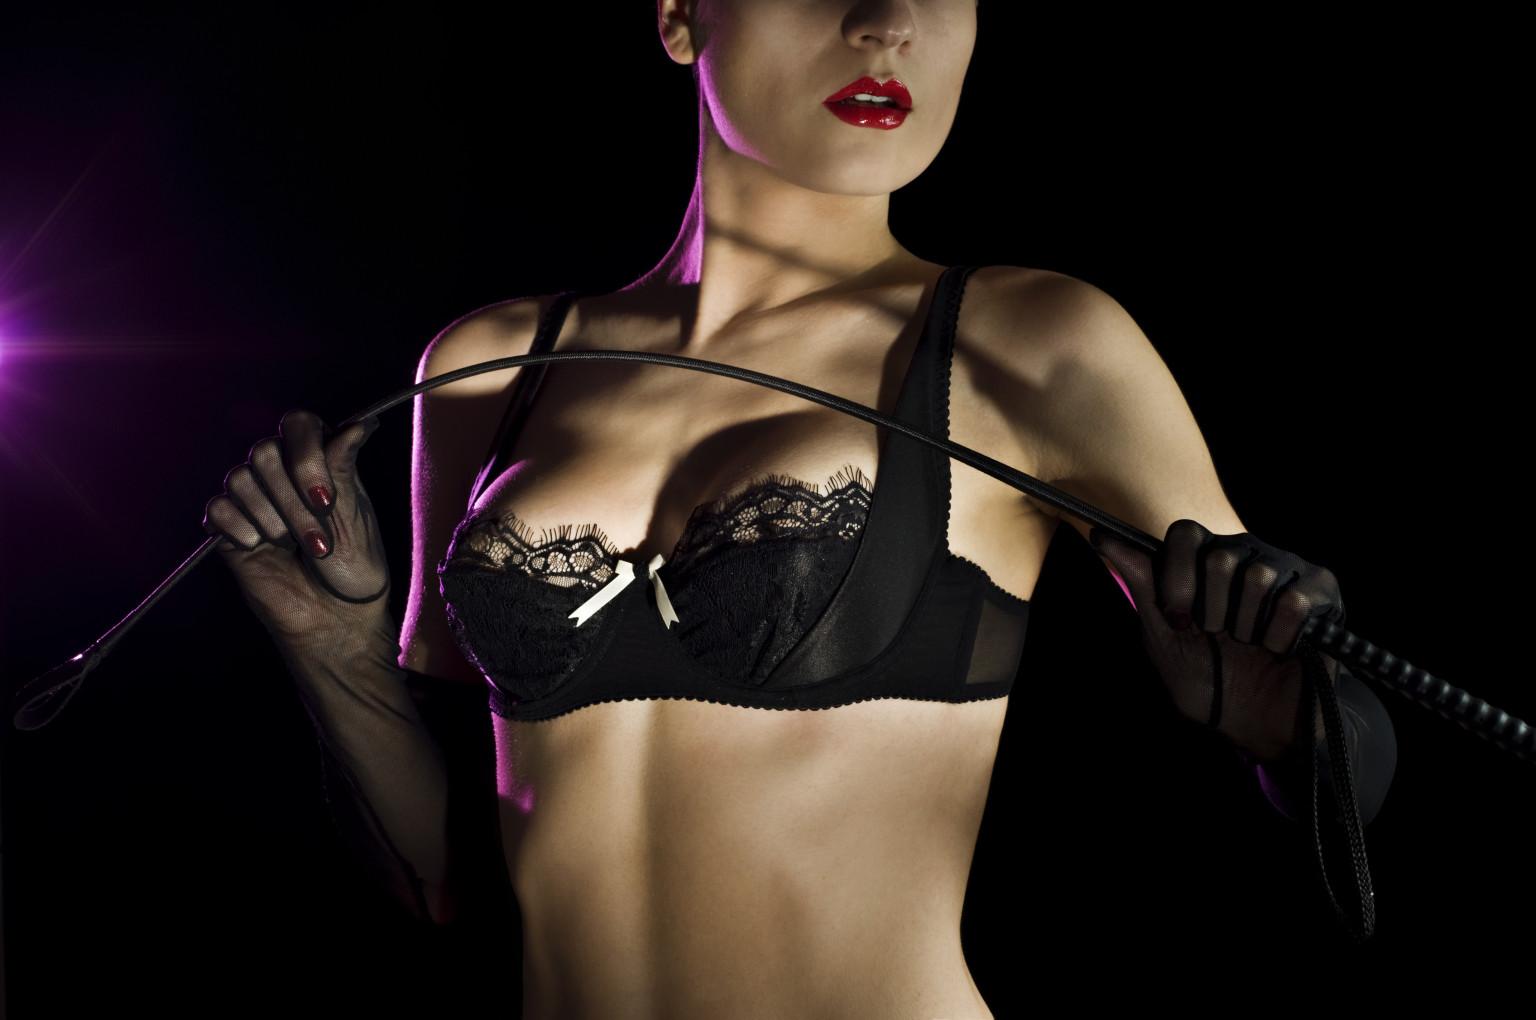 stripper nuna escort girl website